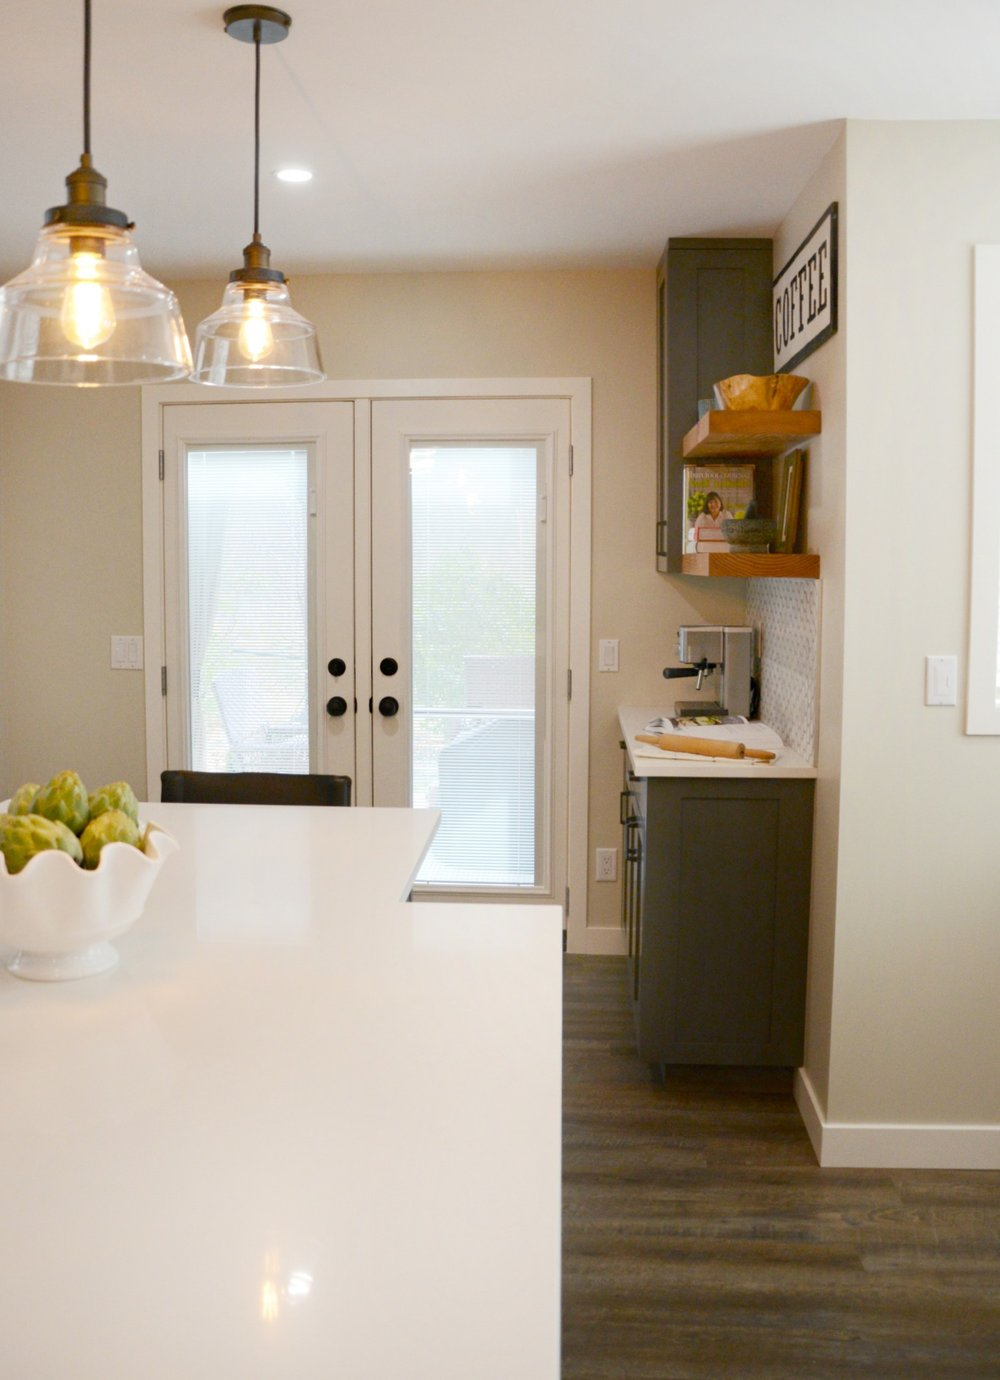 calgary-interior-design-kitchen-renovation-modern-farmhouse-43.jpg